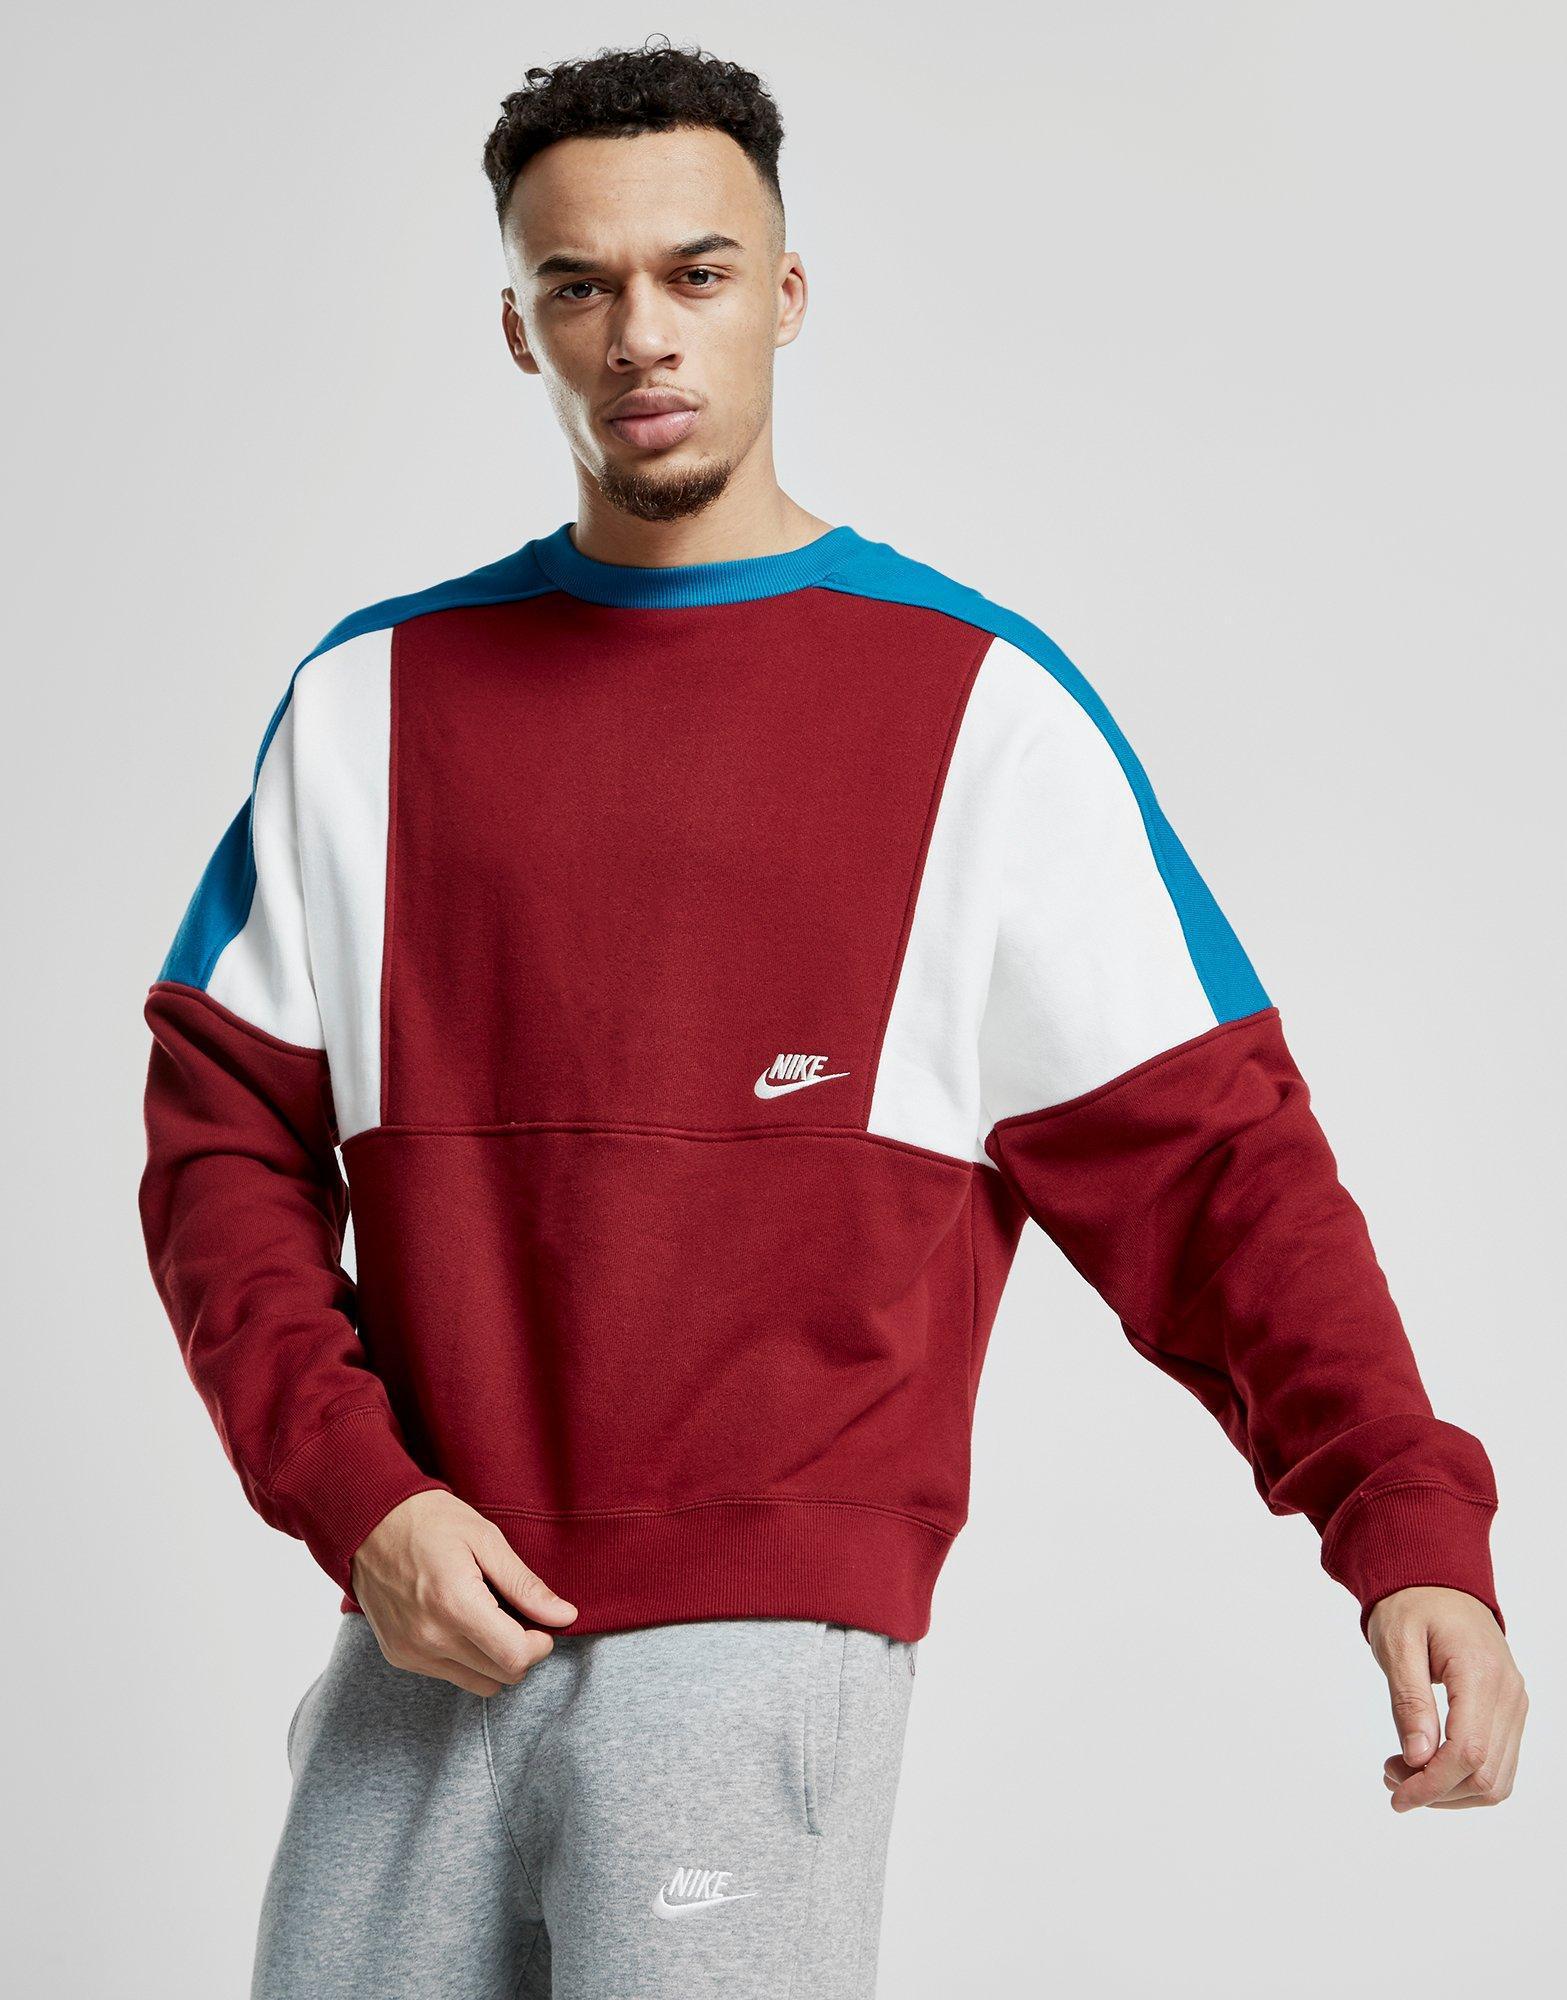 Nike Cotton Reissue Crew Sweatshirt In Red Blue Red For Men Lyst [ 2000 x 1567 Pixel ]